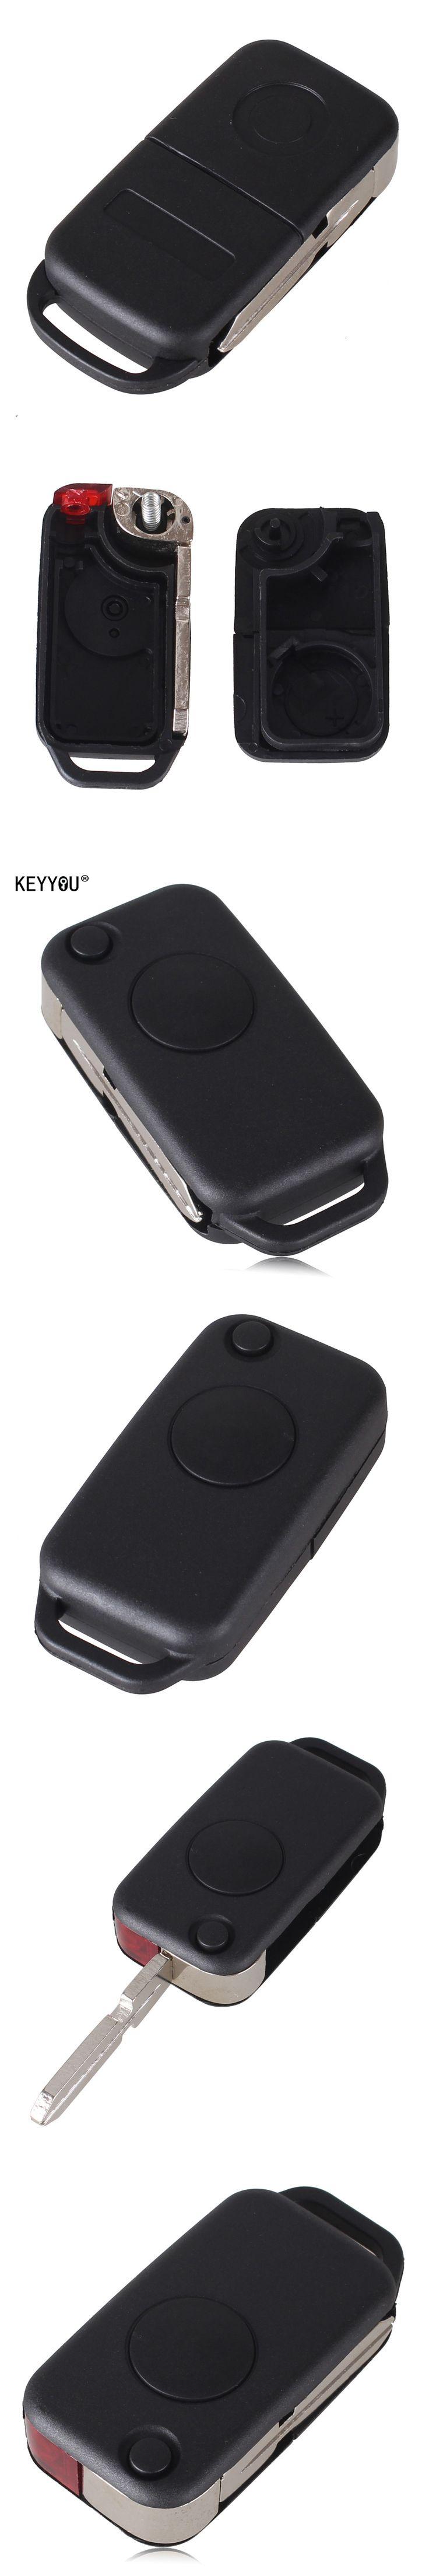 KEYYOU 1 Button Flip Folding Keyless Entry Remote Key Fob Case Shell for Mercedes Benz C E S ML SL ML55 AMG S500 SL500